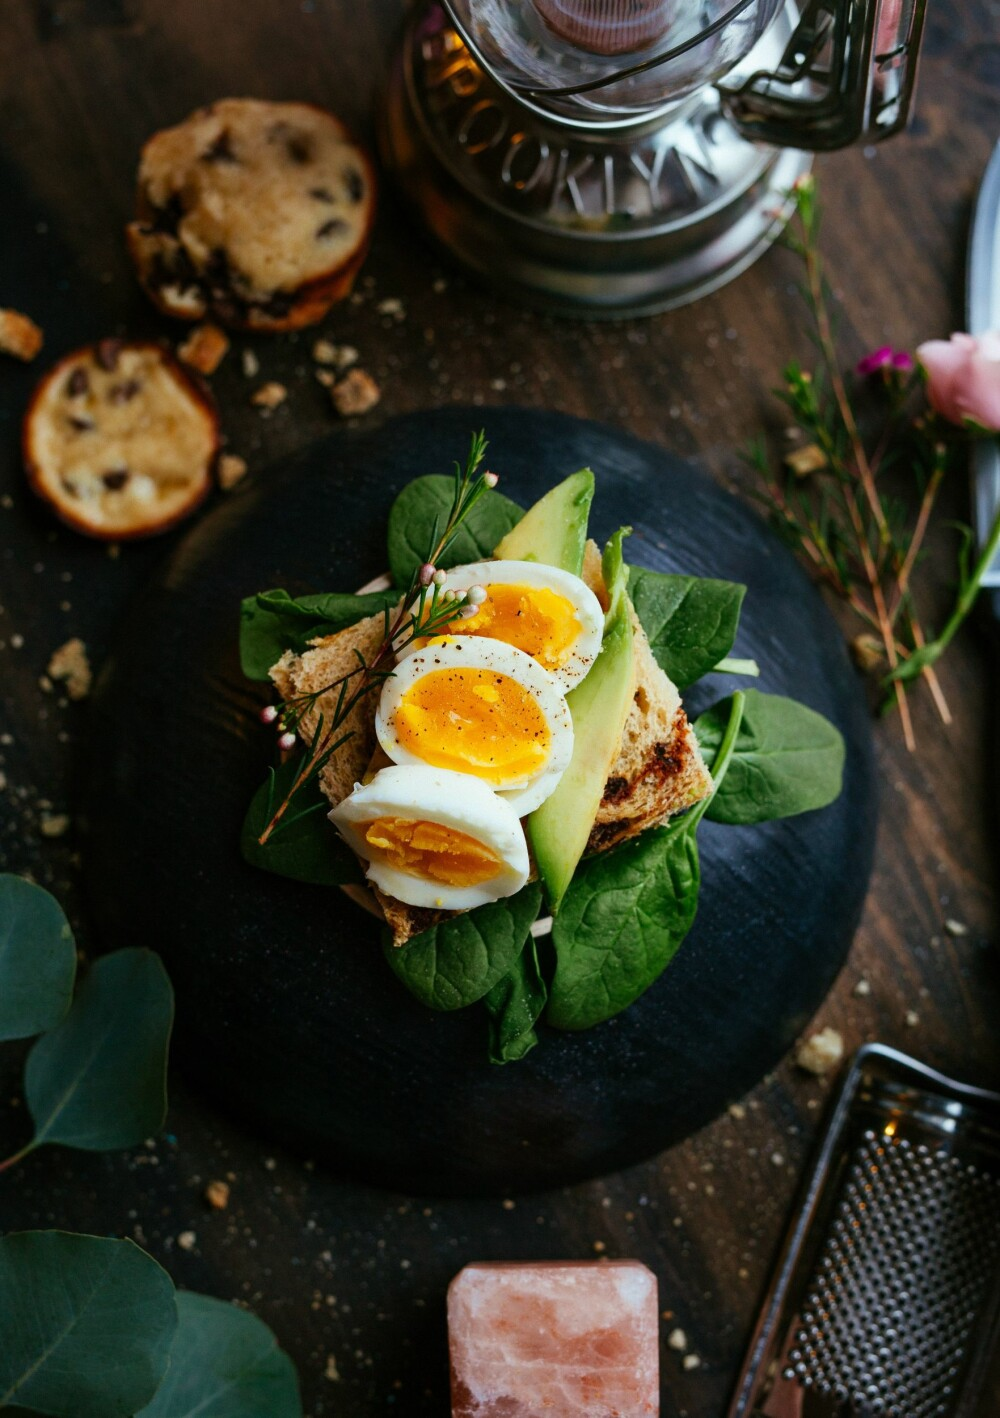 Rundstykke med kokt egg er en sikker vinner til frokost.